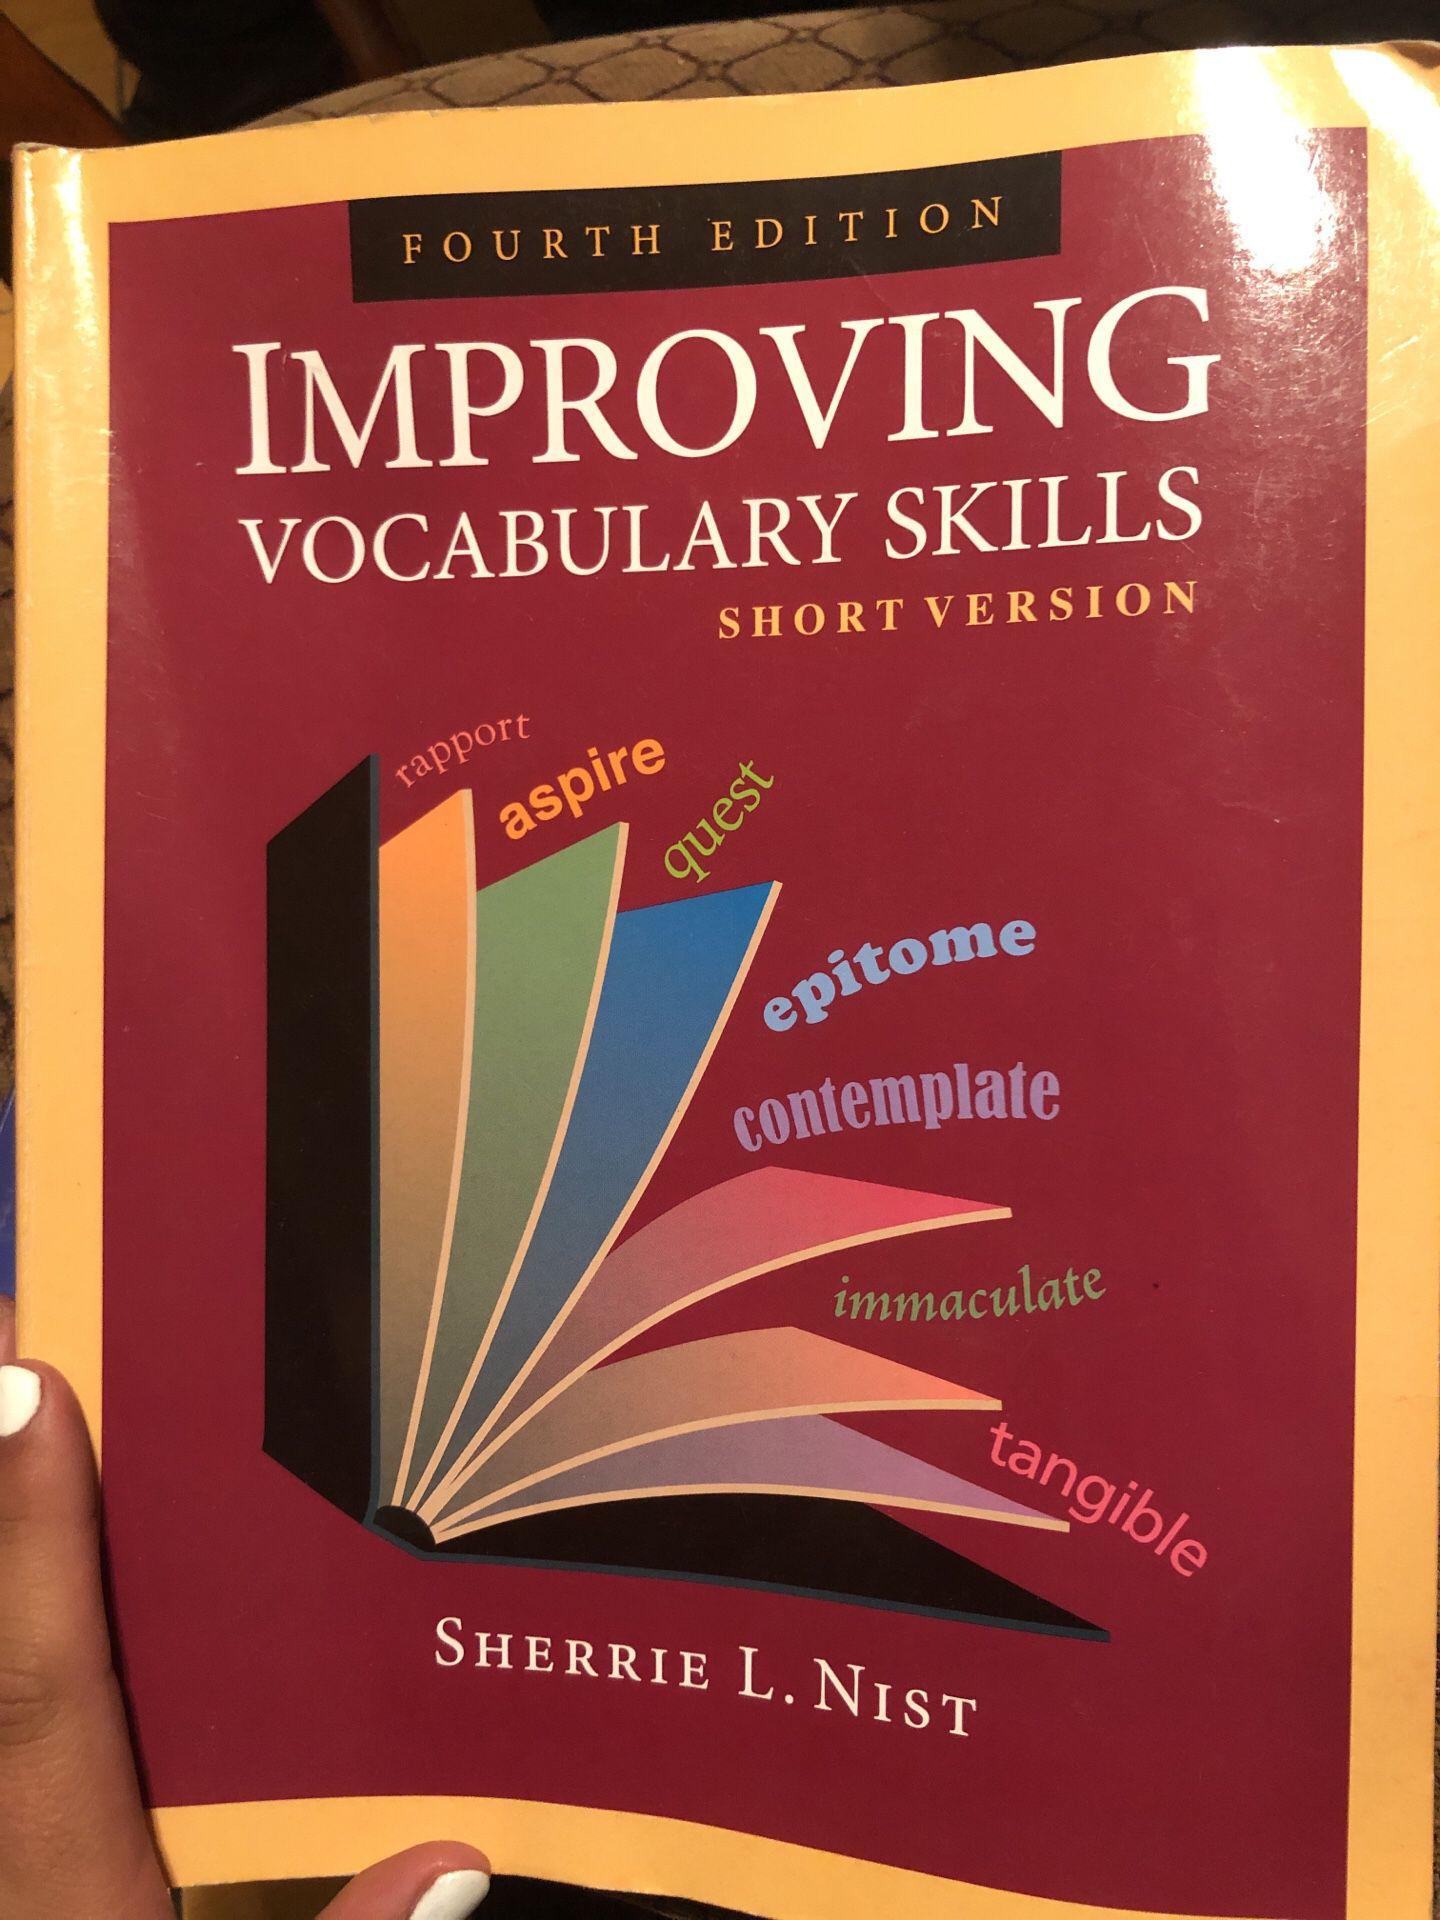 4th edition improving vocabulary skills (short version)